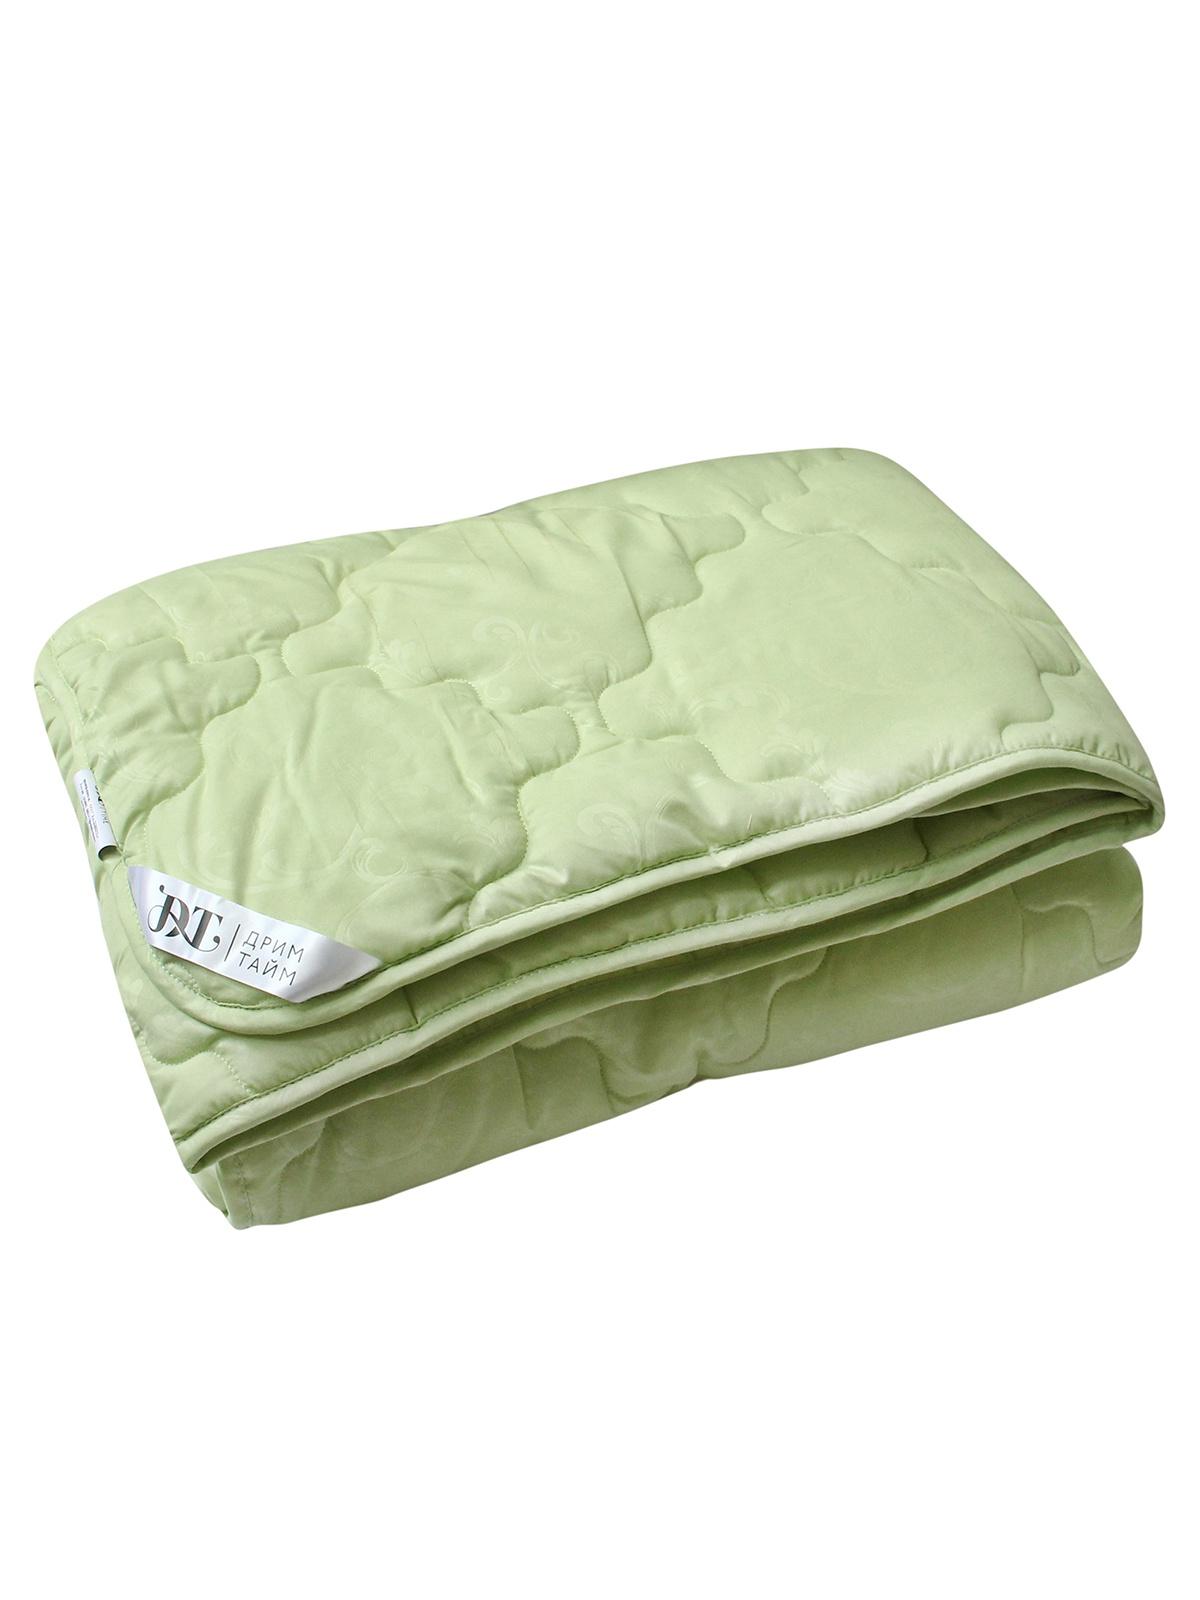 цена на Одеяло Dream Time, ДТ-ОМА-О-22, светло-зеленый, 200 х 220 см